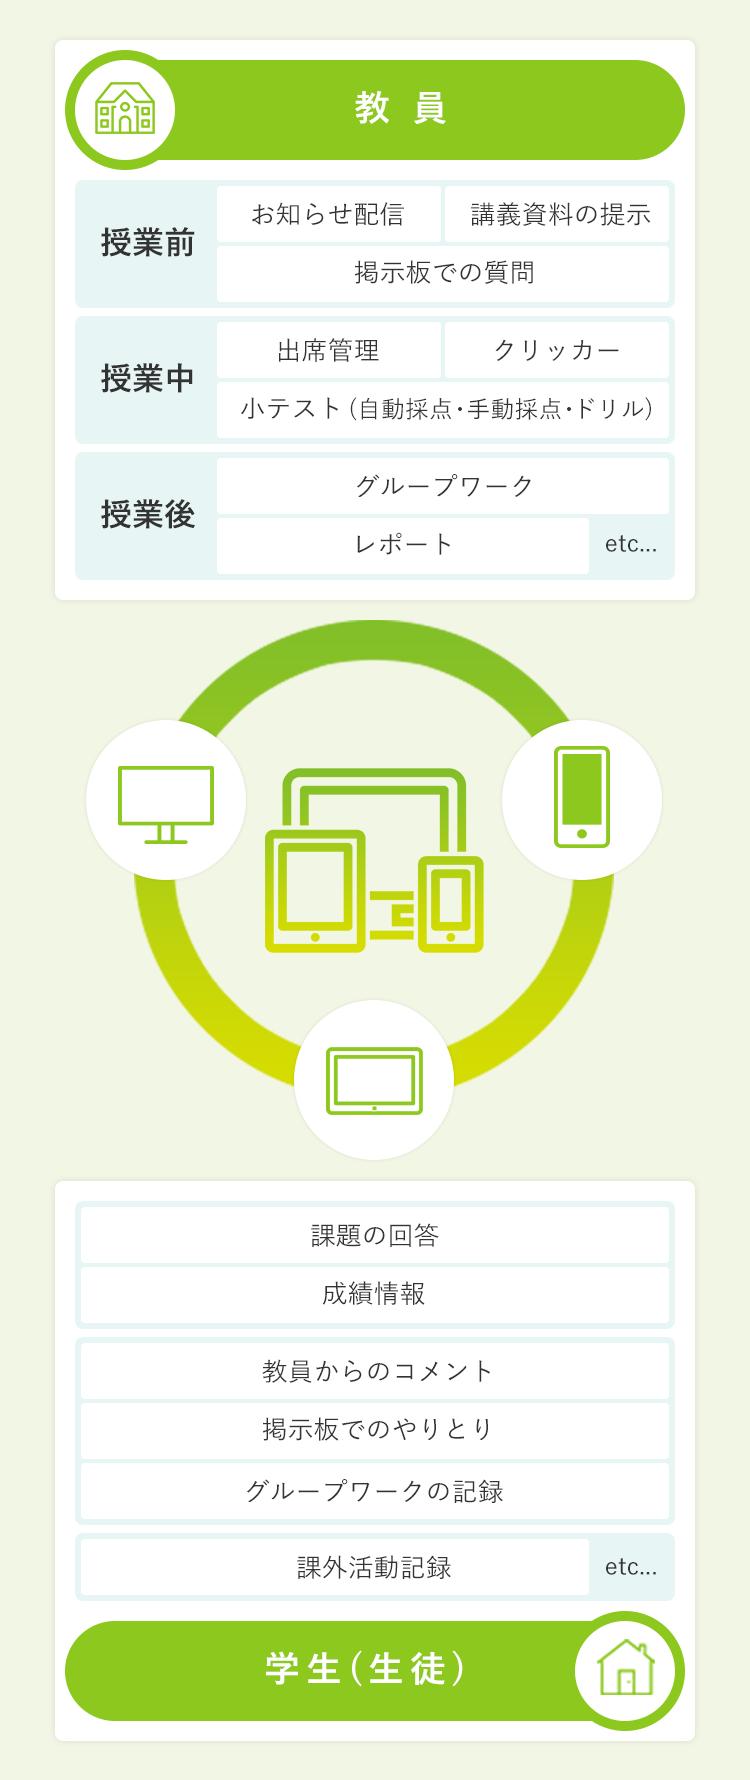 Manaba 筑波 大学